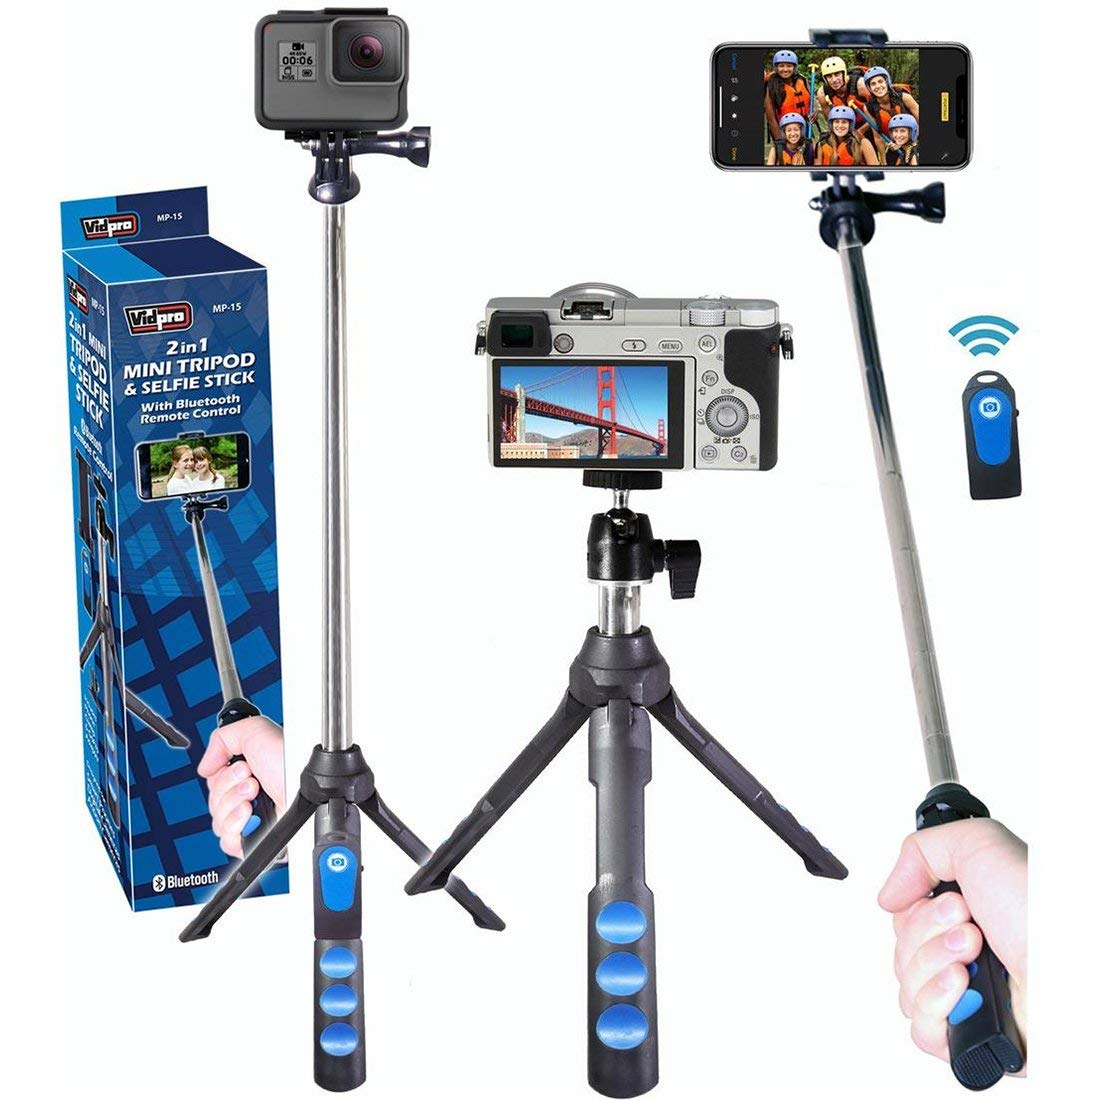 Vidpro MP-15 2-in-1 Mini Tripod/Selfie Stick with Bluetooth Remote Control